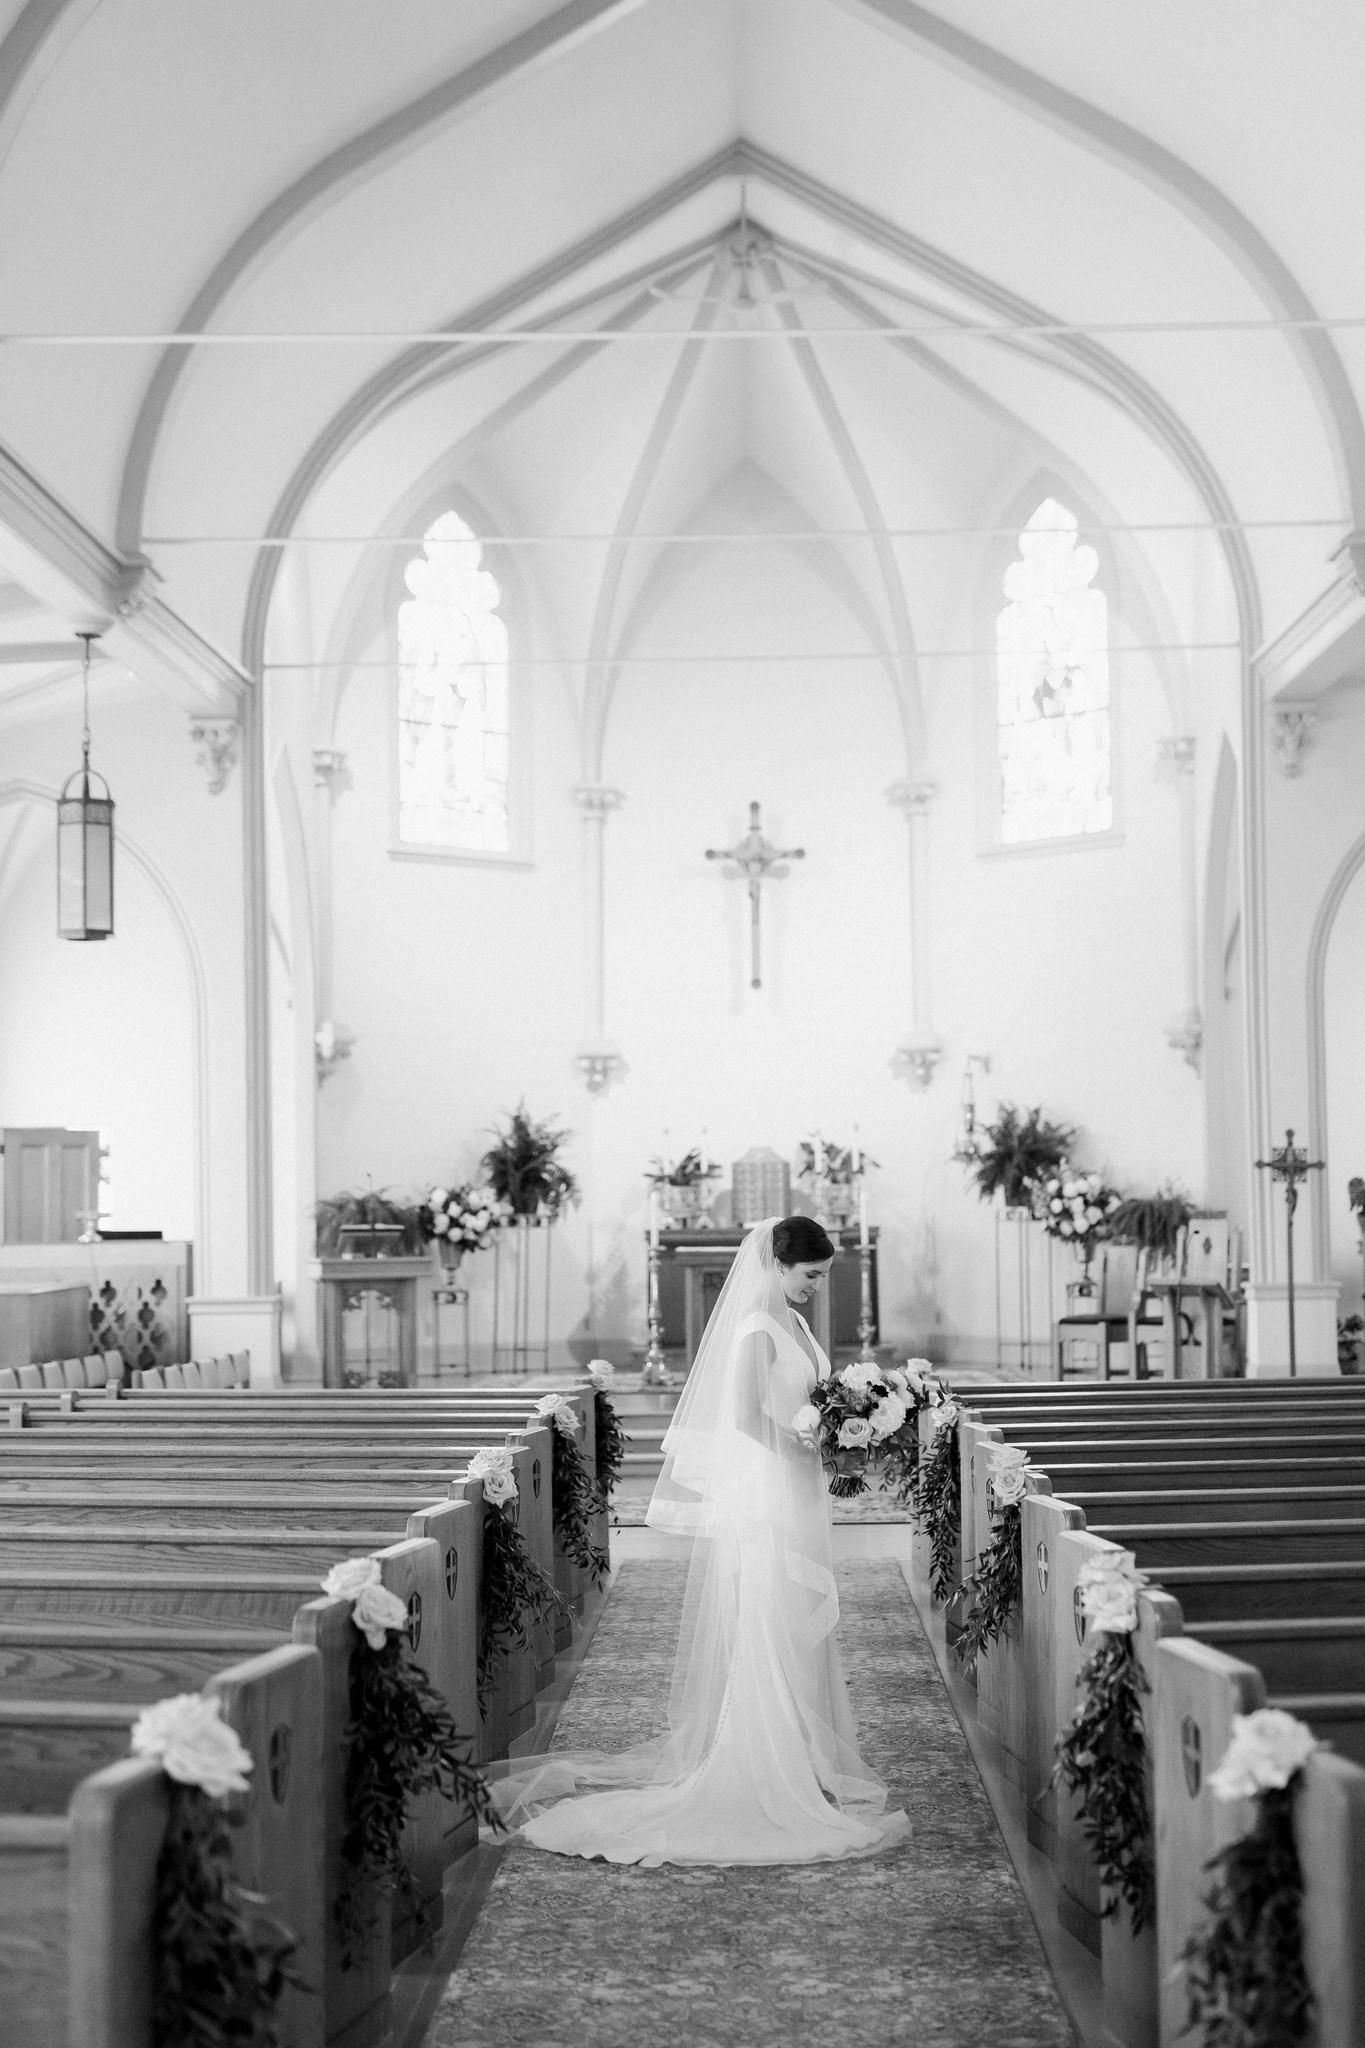 branford house wedding_ct wedding photographer_ct wedding-25_Easy-Resize.com copy.jpg